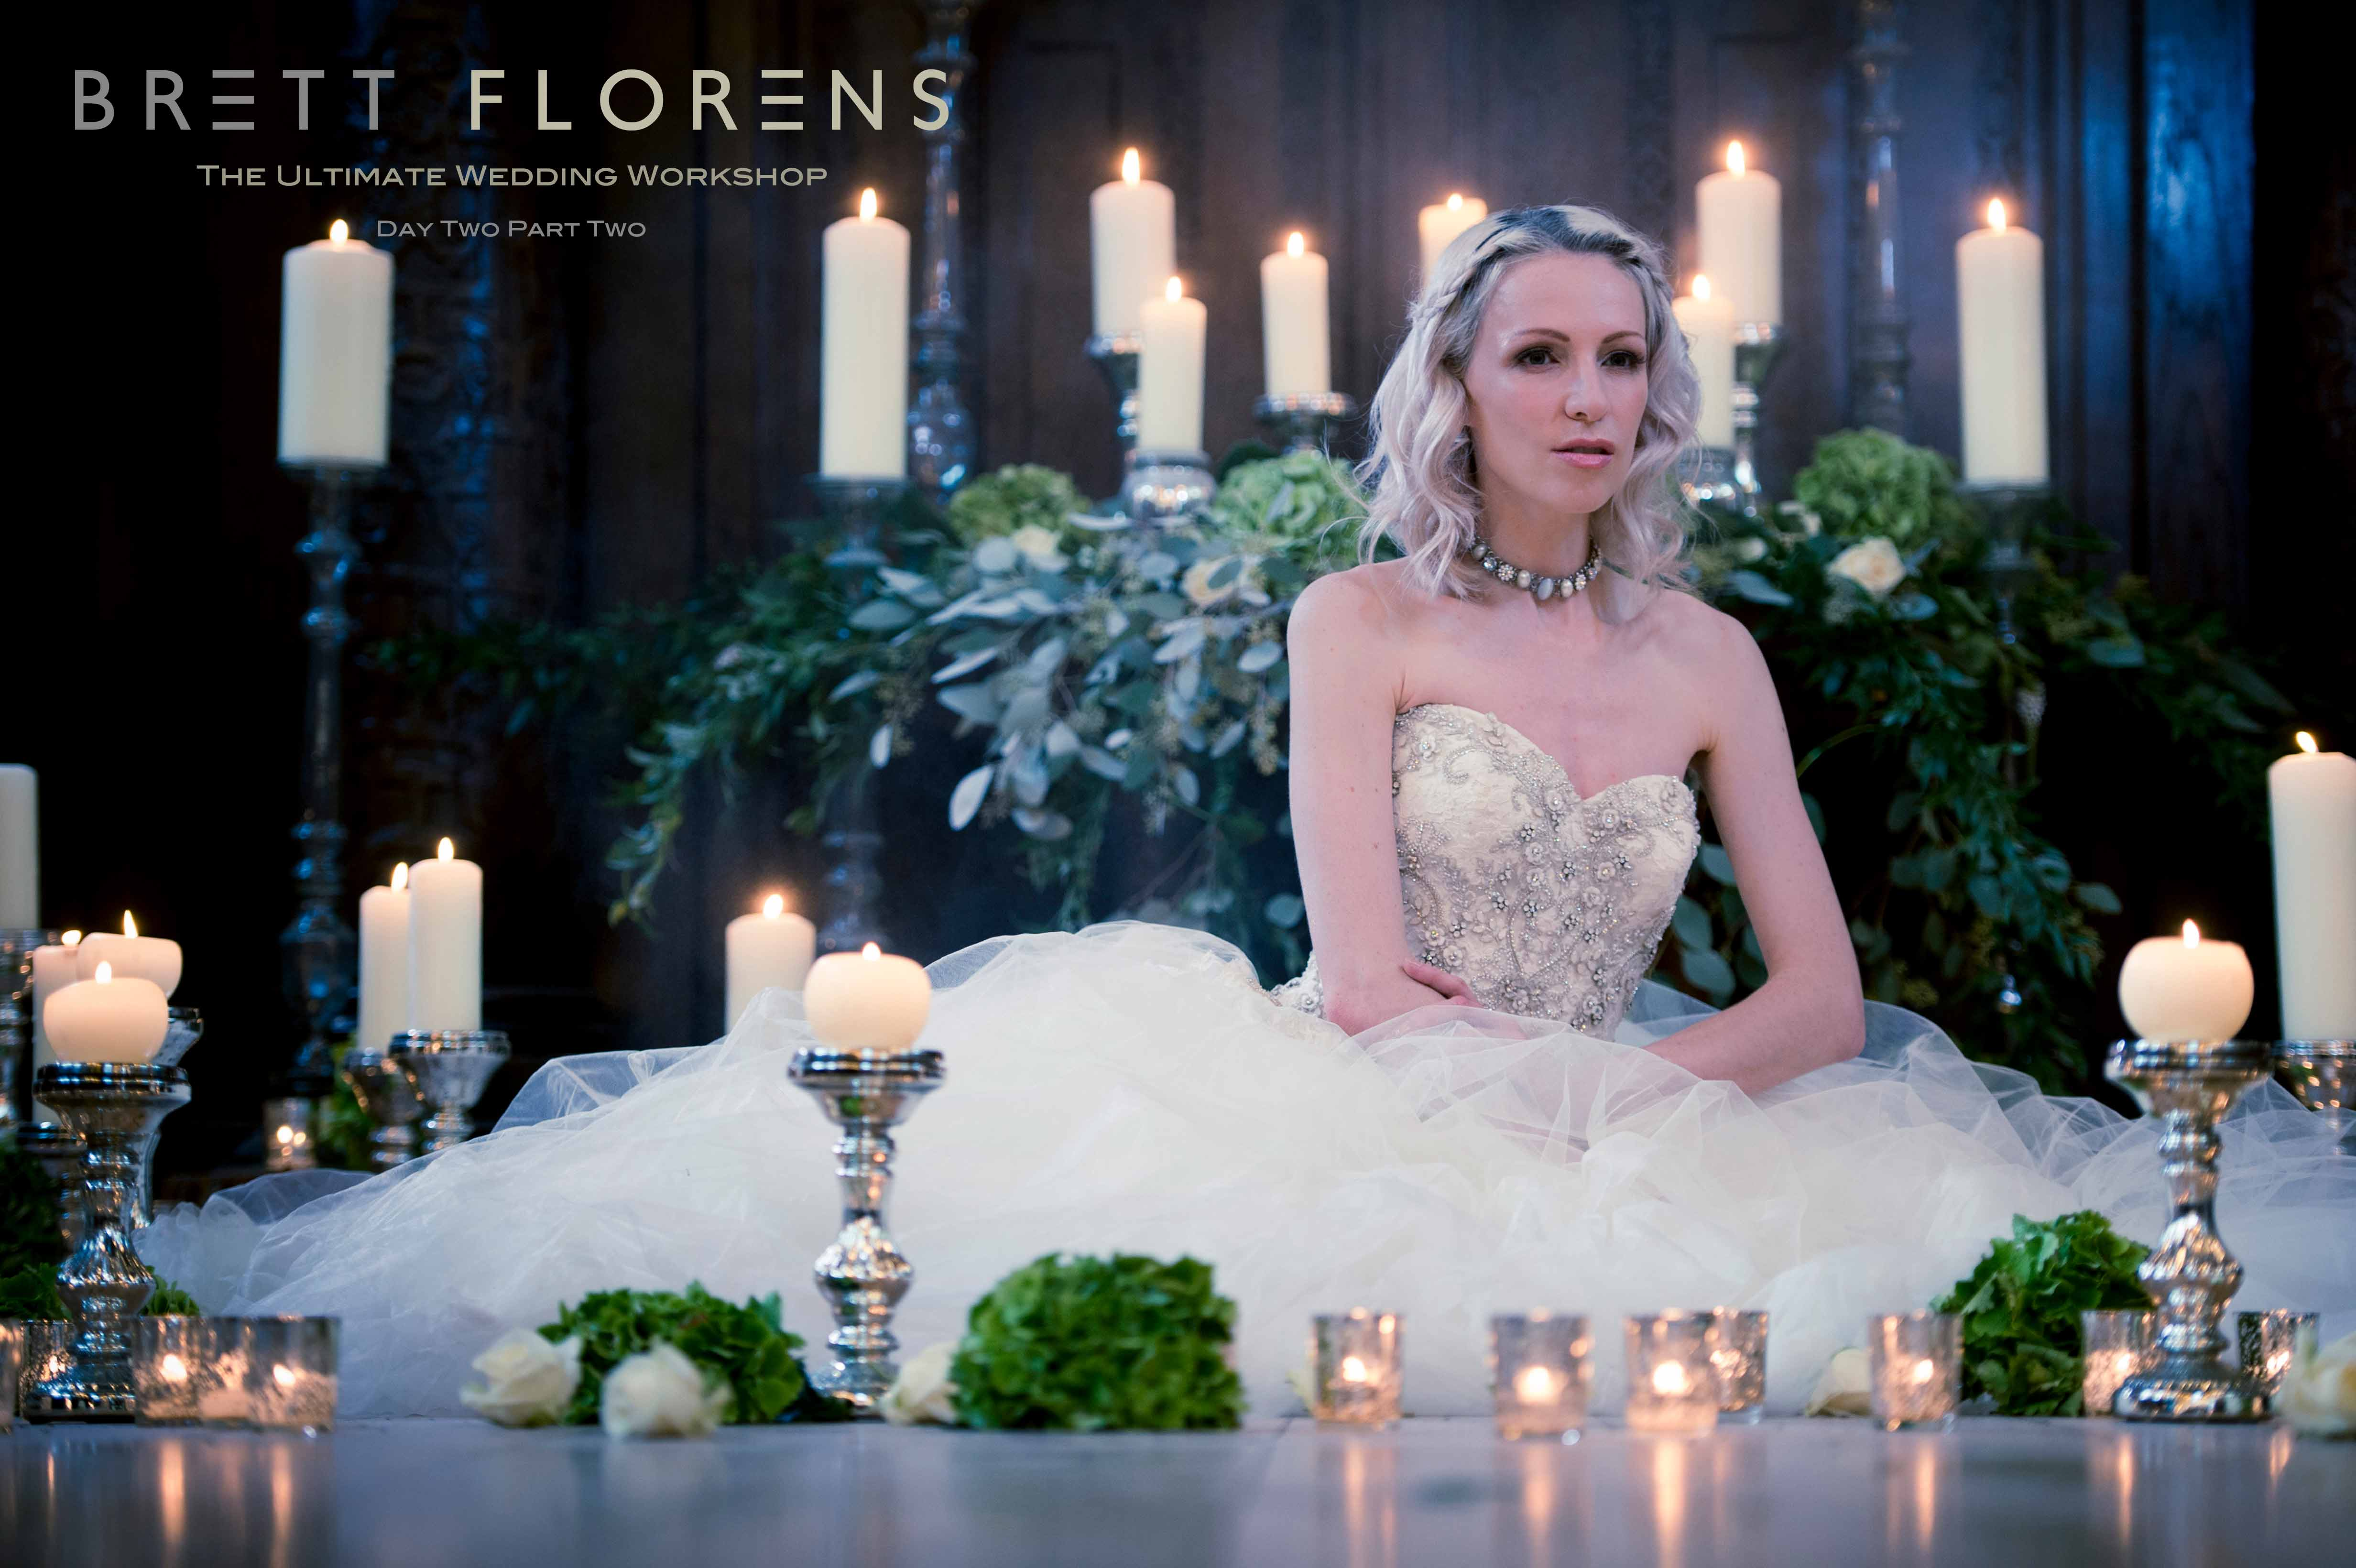 wedding photography workshop 5